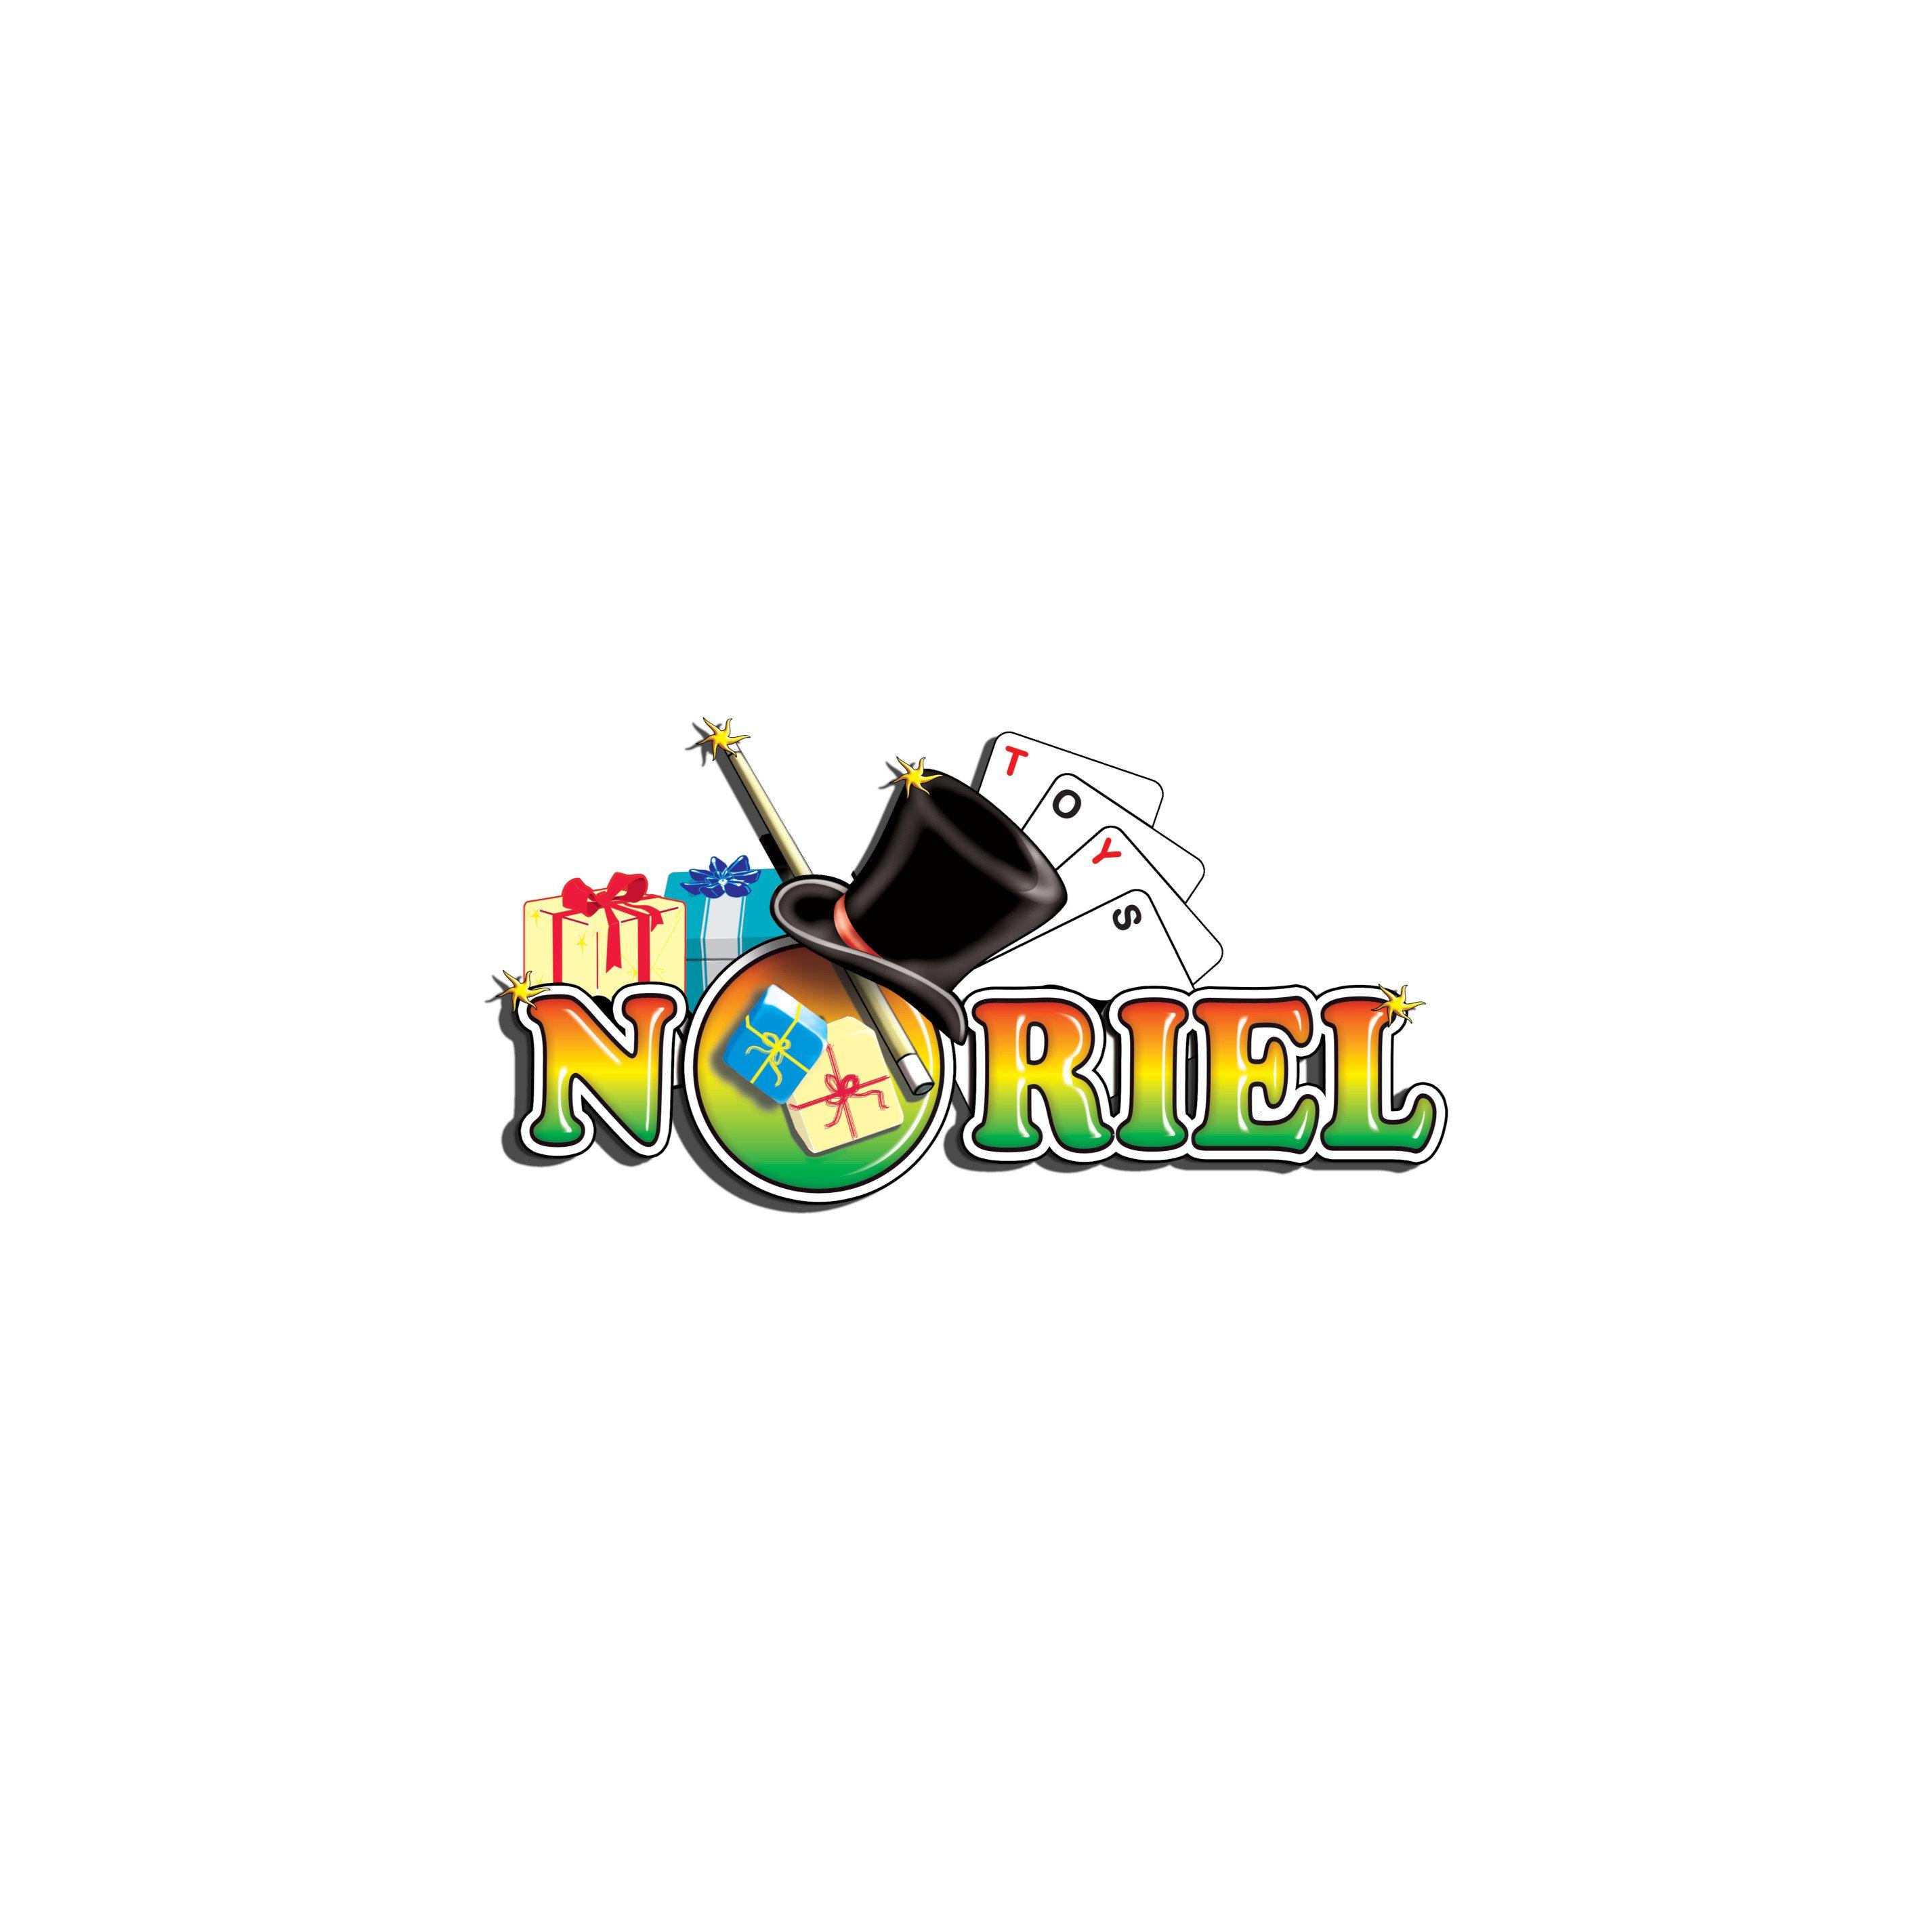 559900E7C_001w Kit pentru slime Poopsie Chasmell Rainbow